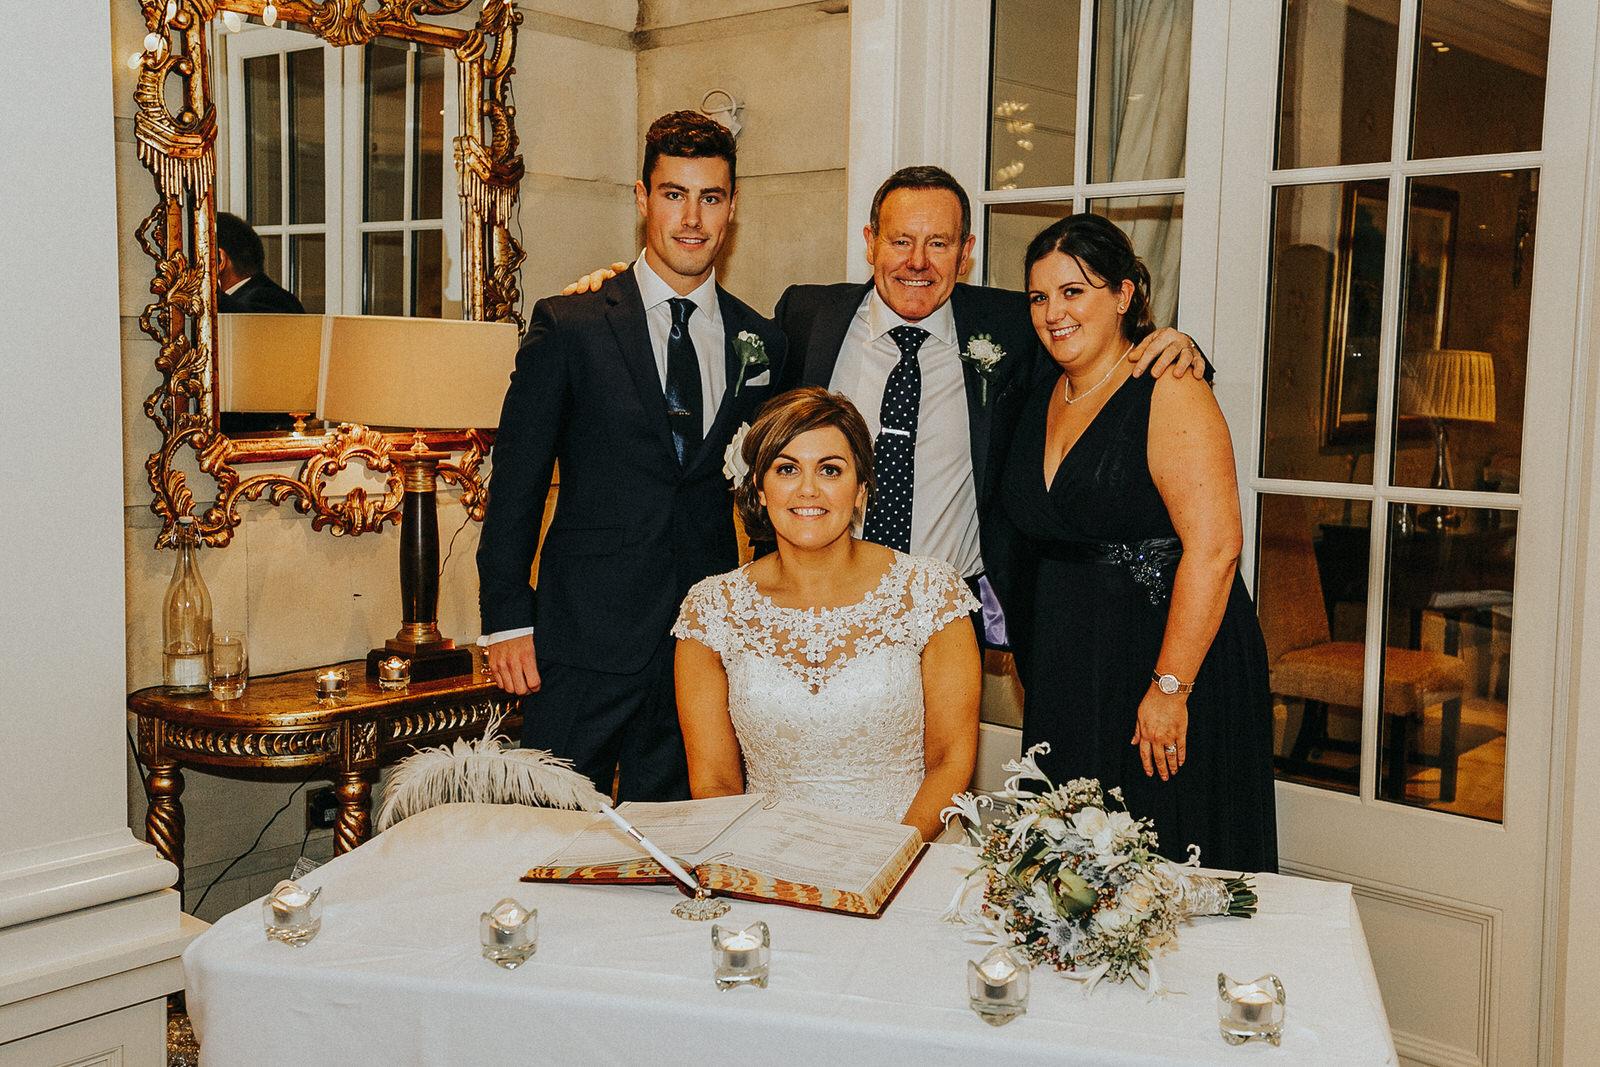 Roger_Kenny_wedding_photographer_Tankardstown_611.jpg